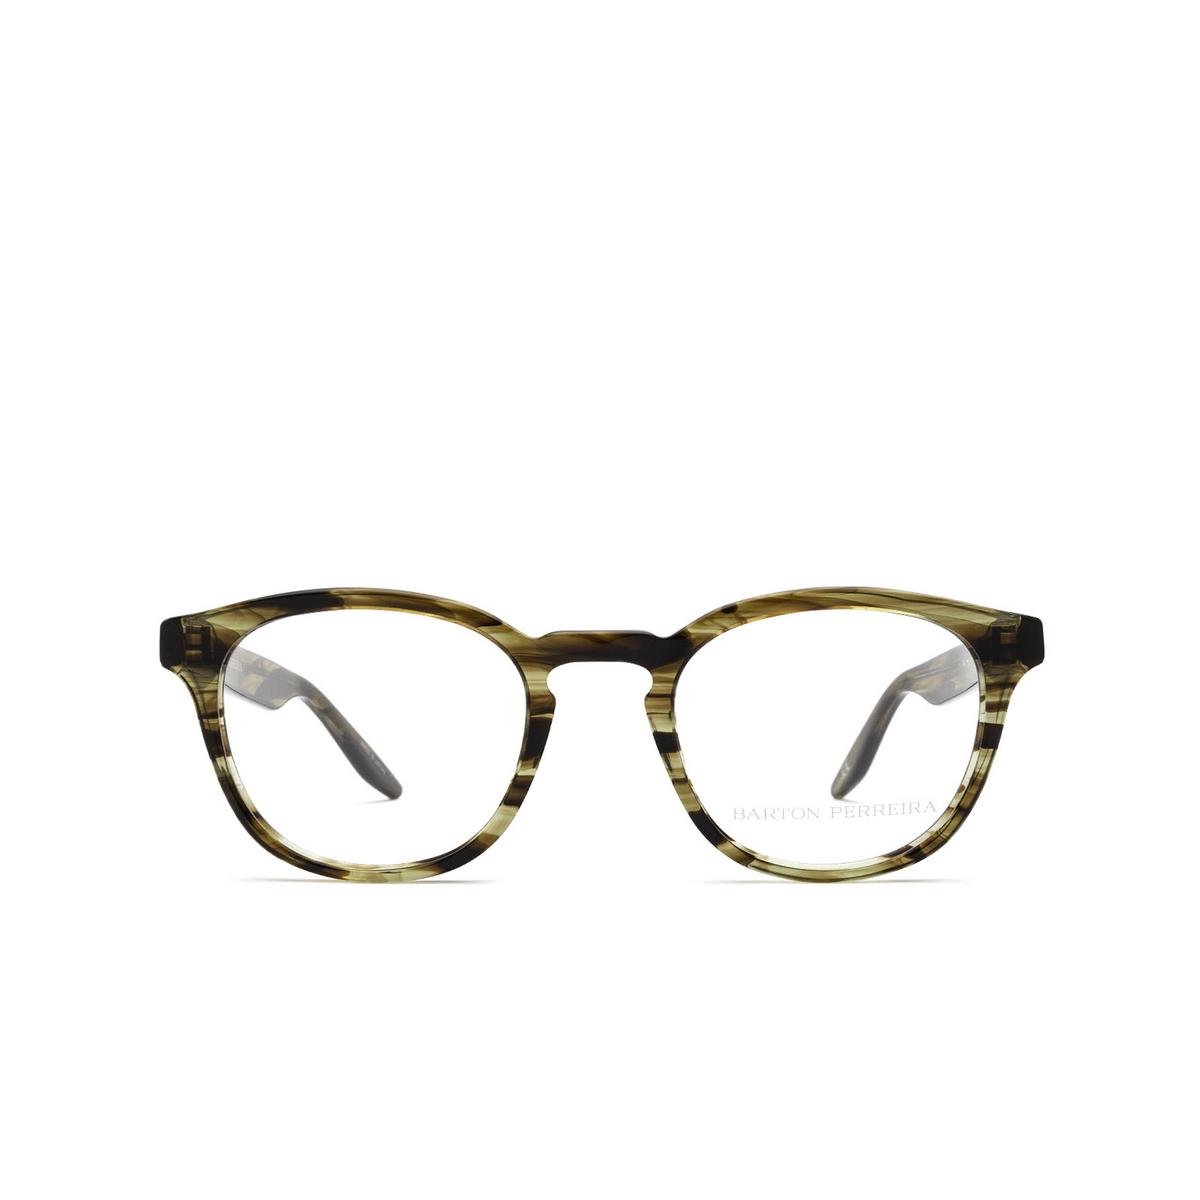 Barton Perreira® Square Eyeglasses: Gellert BP5027 color Sulcata Tortoise 2EJ - front view.